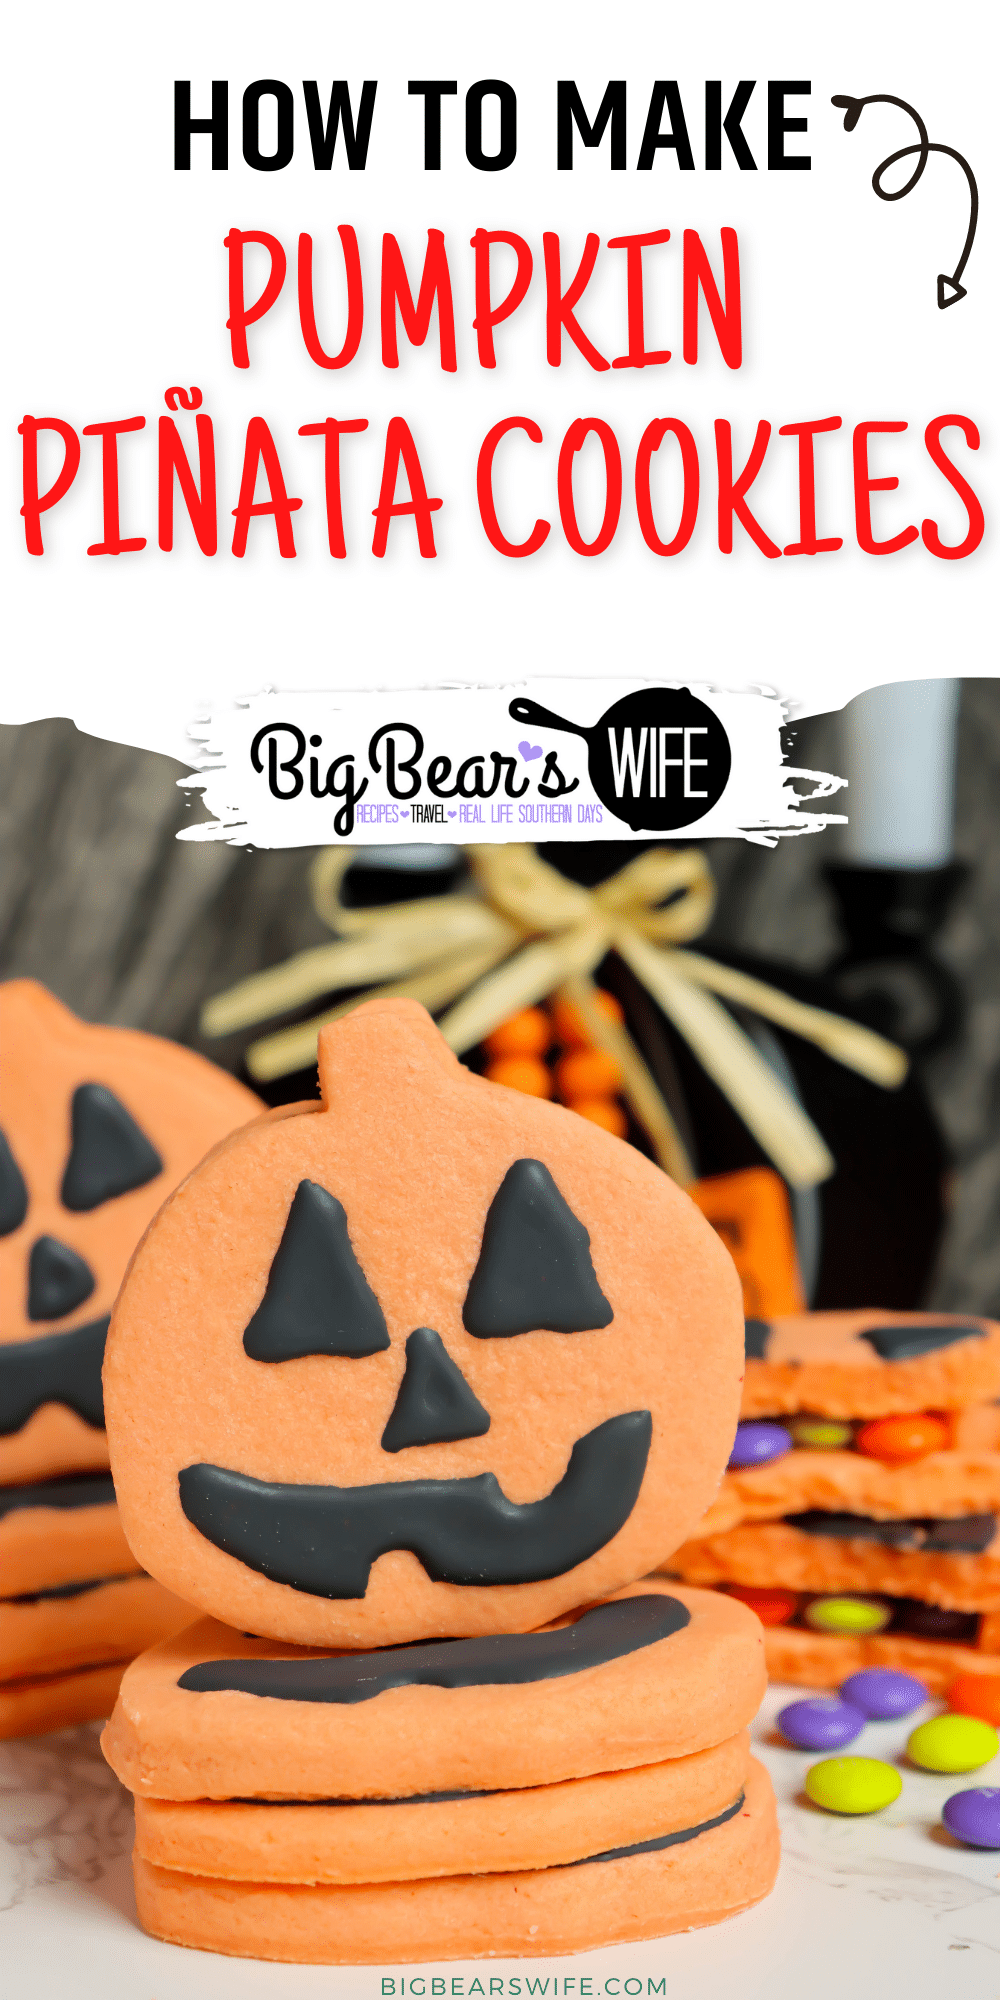 Pumpkin Piñata Cookies - homemade orange sugar cookies stacked together, decorated like Jack-O-Lanterns and filled with Halloween candy!  via @bigbearswife